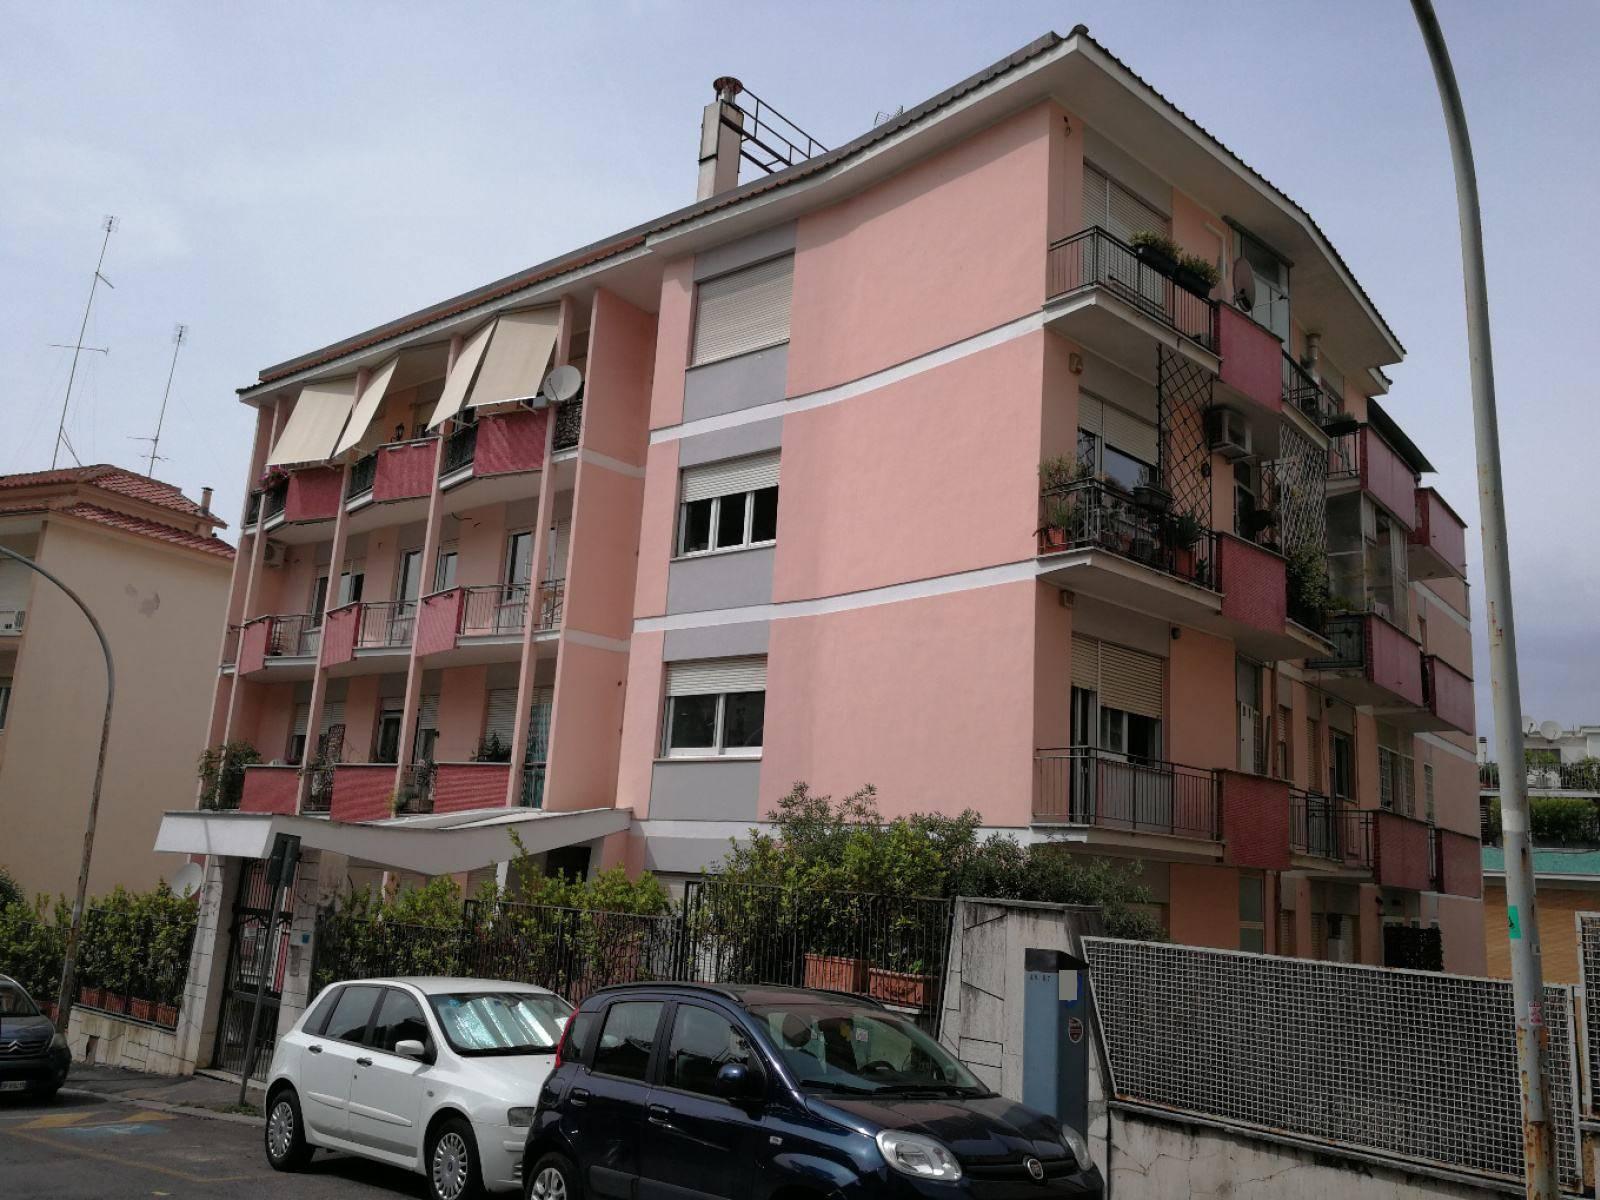 1118418722 Trilocale in Via Giacinta Pezzana, Roma, Zona Parioli